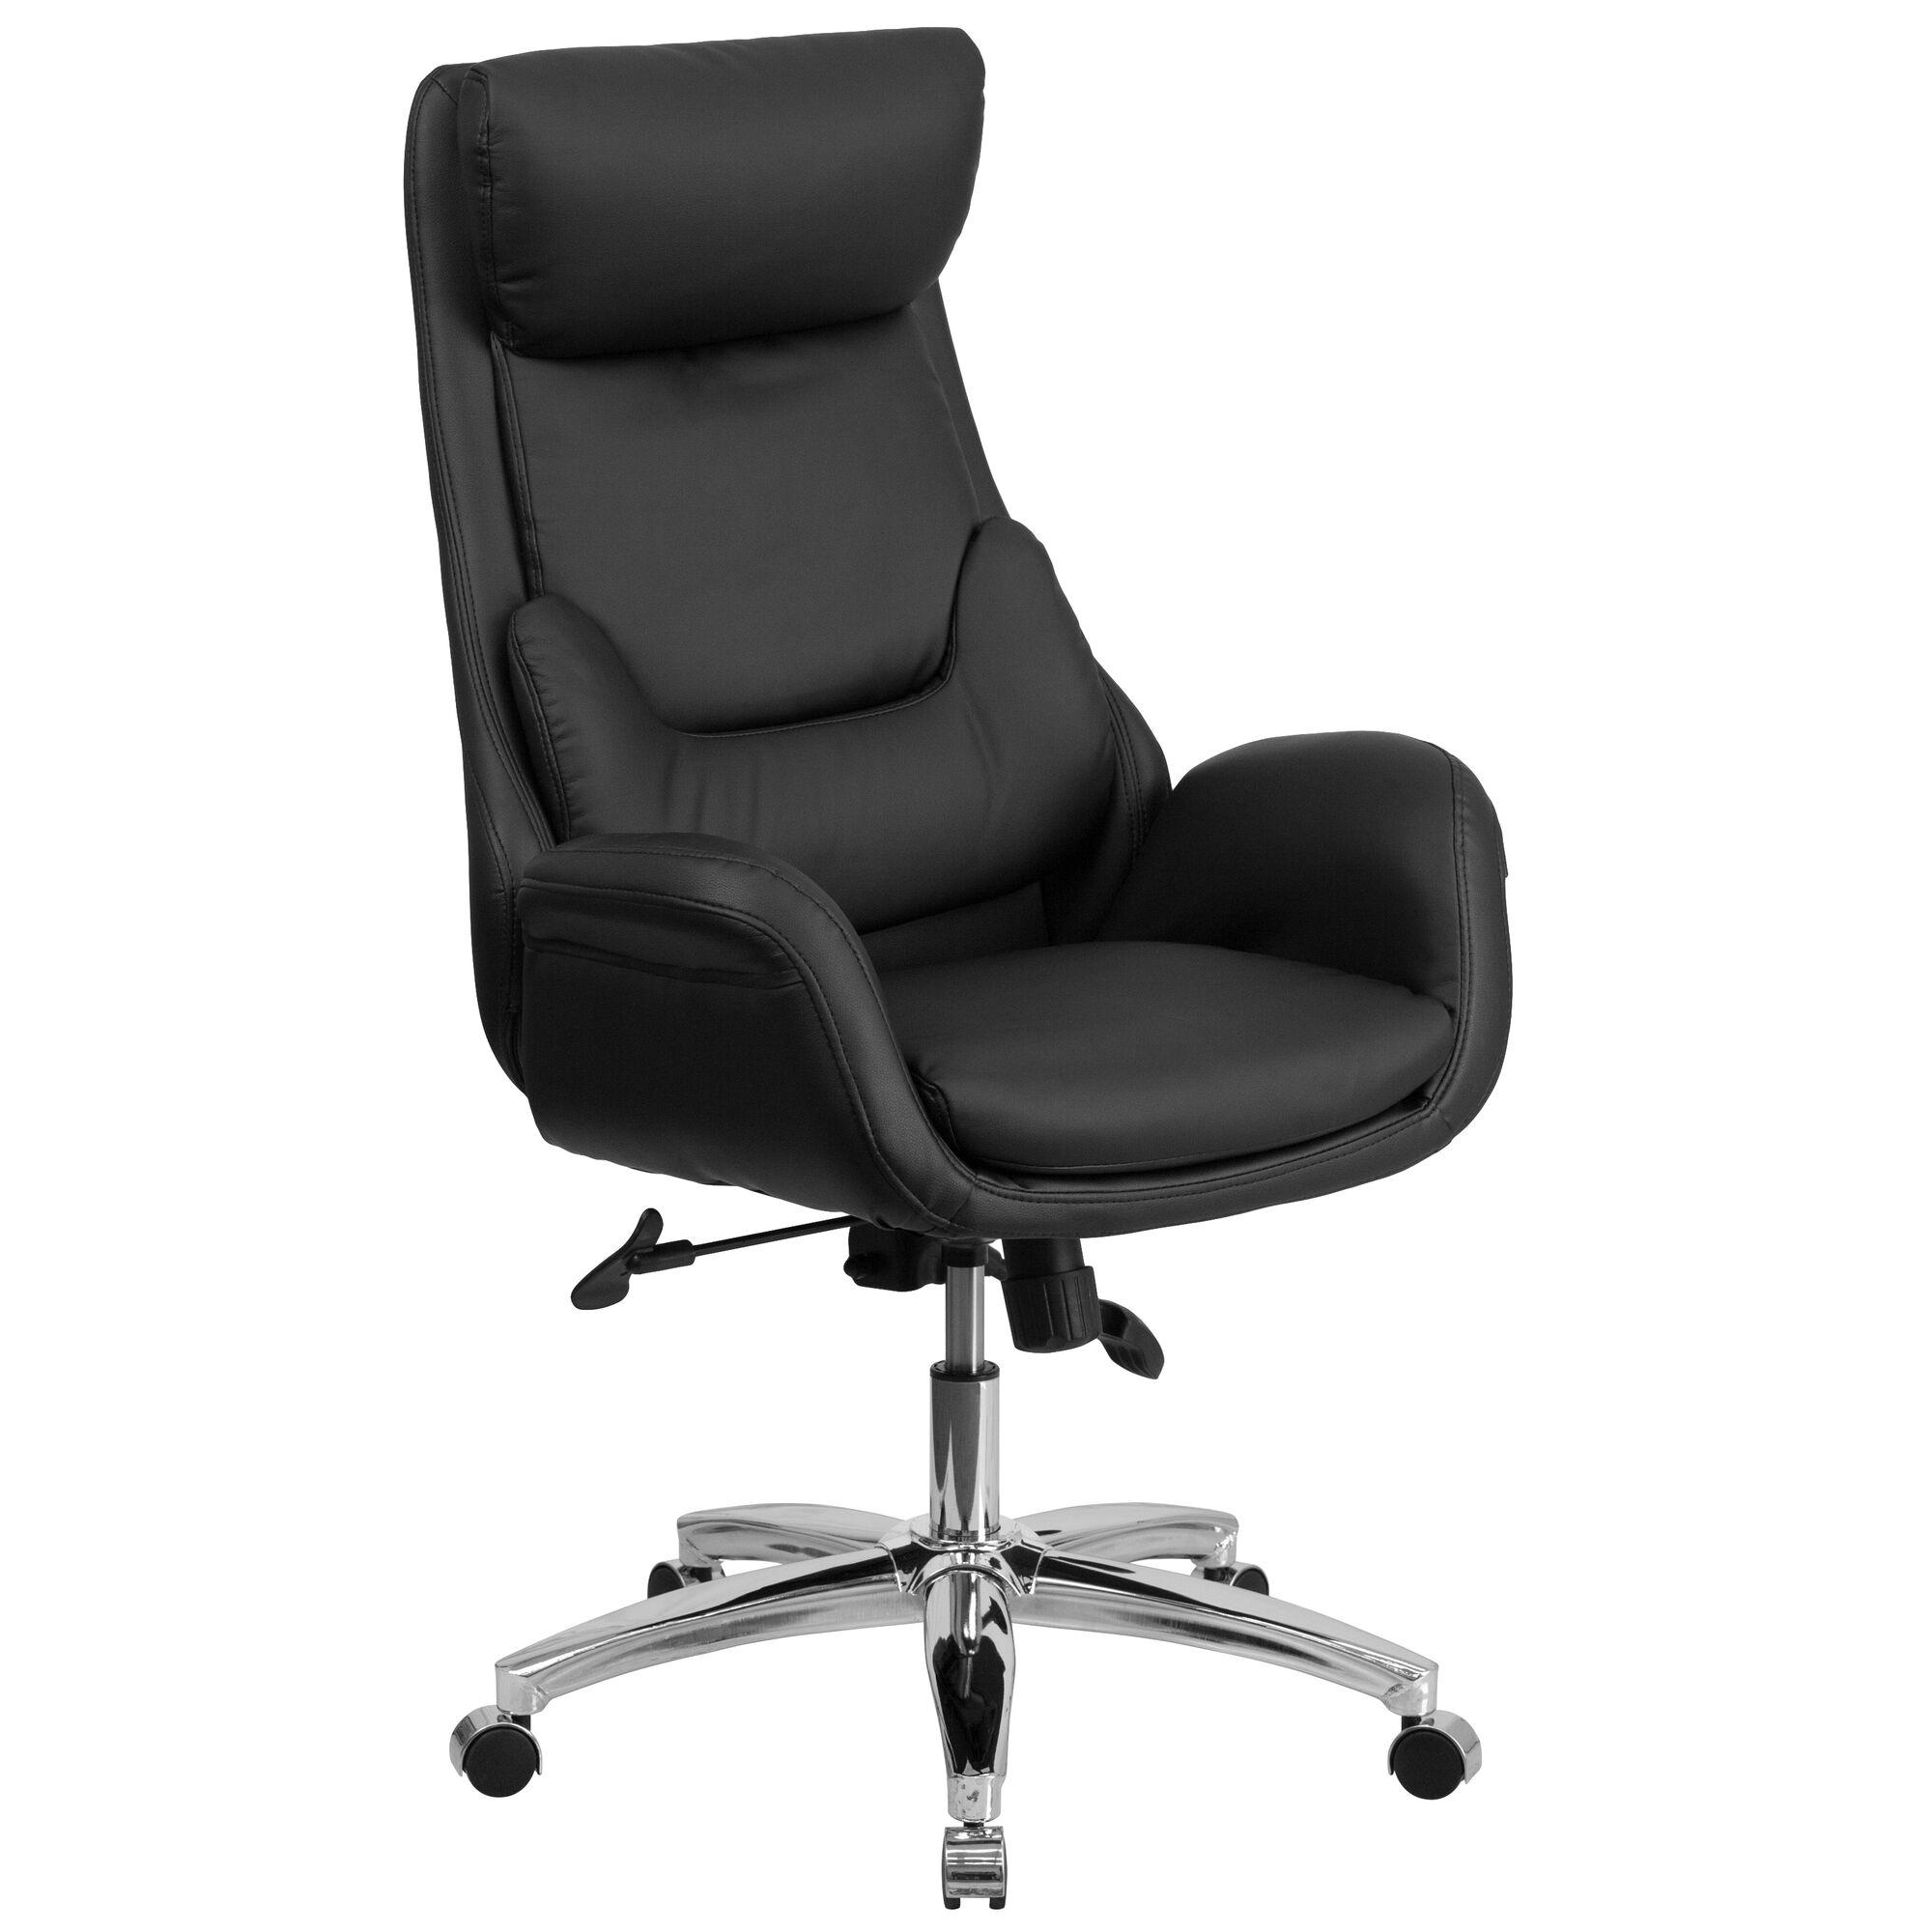 Black High Back Leather Chair Bt 90027oh Gg Bizchair Com